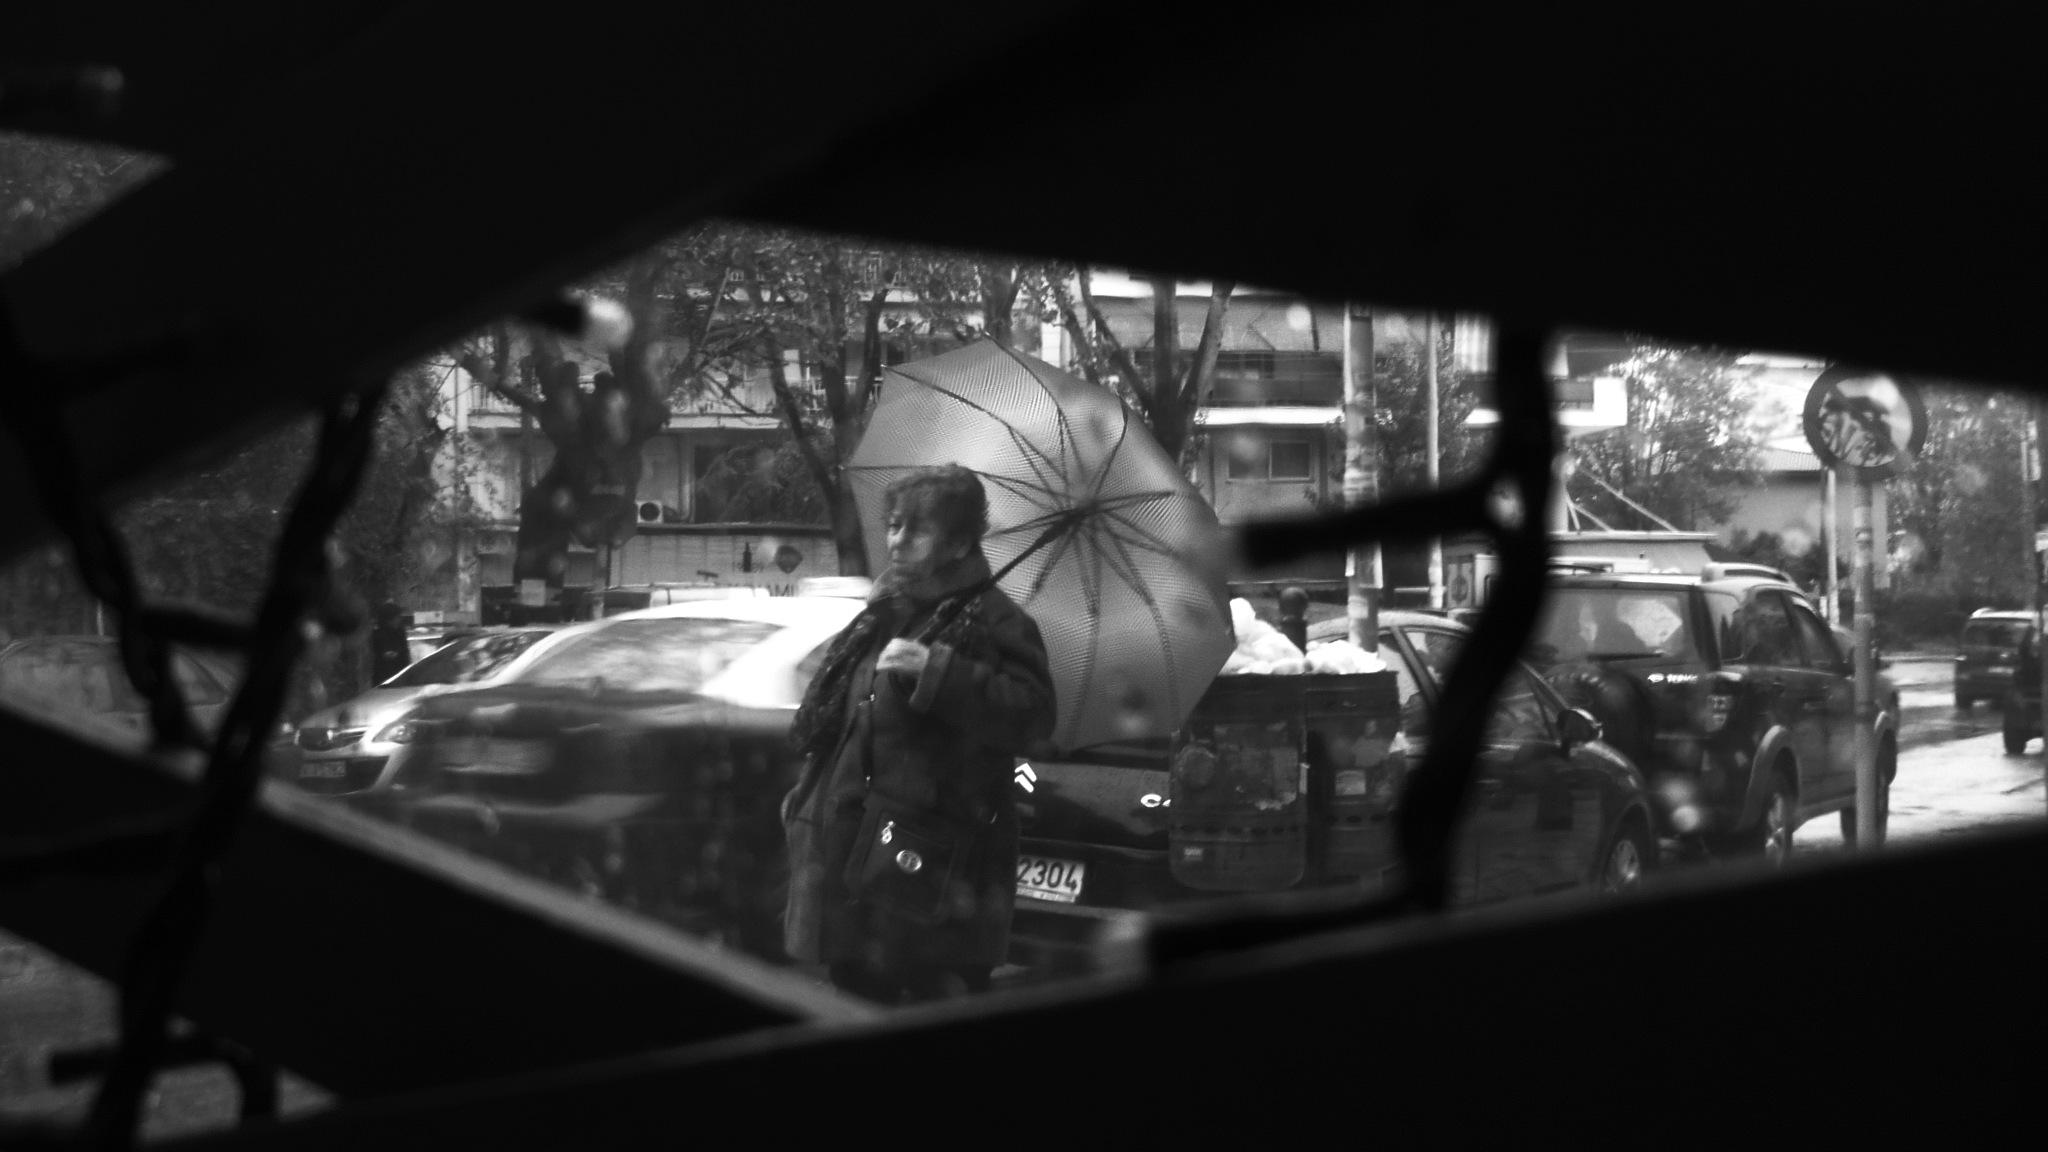 thessaloniki//2016 street photography by apostolis kesidis